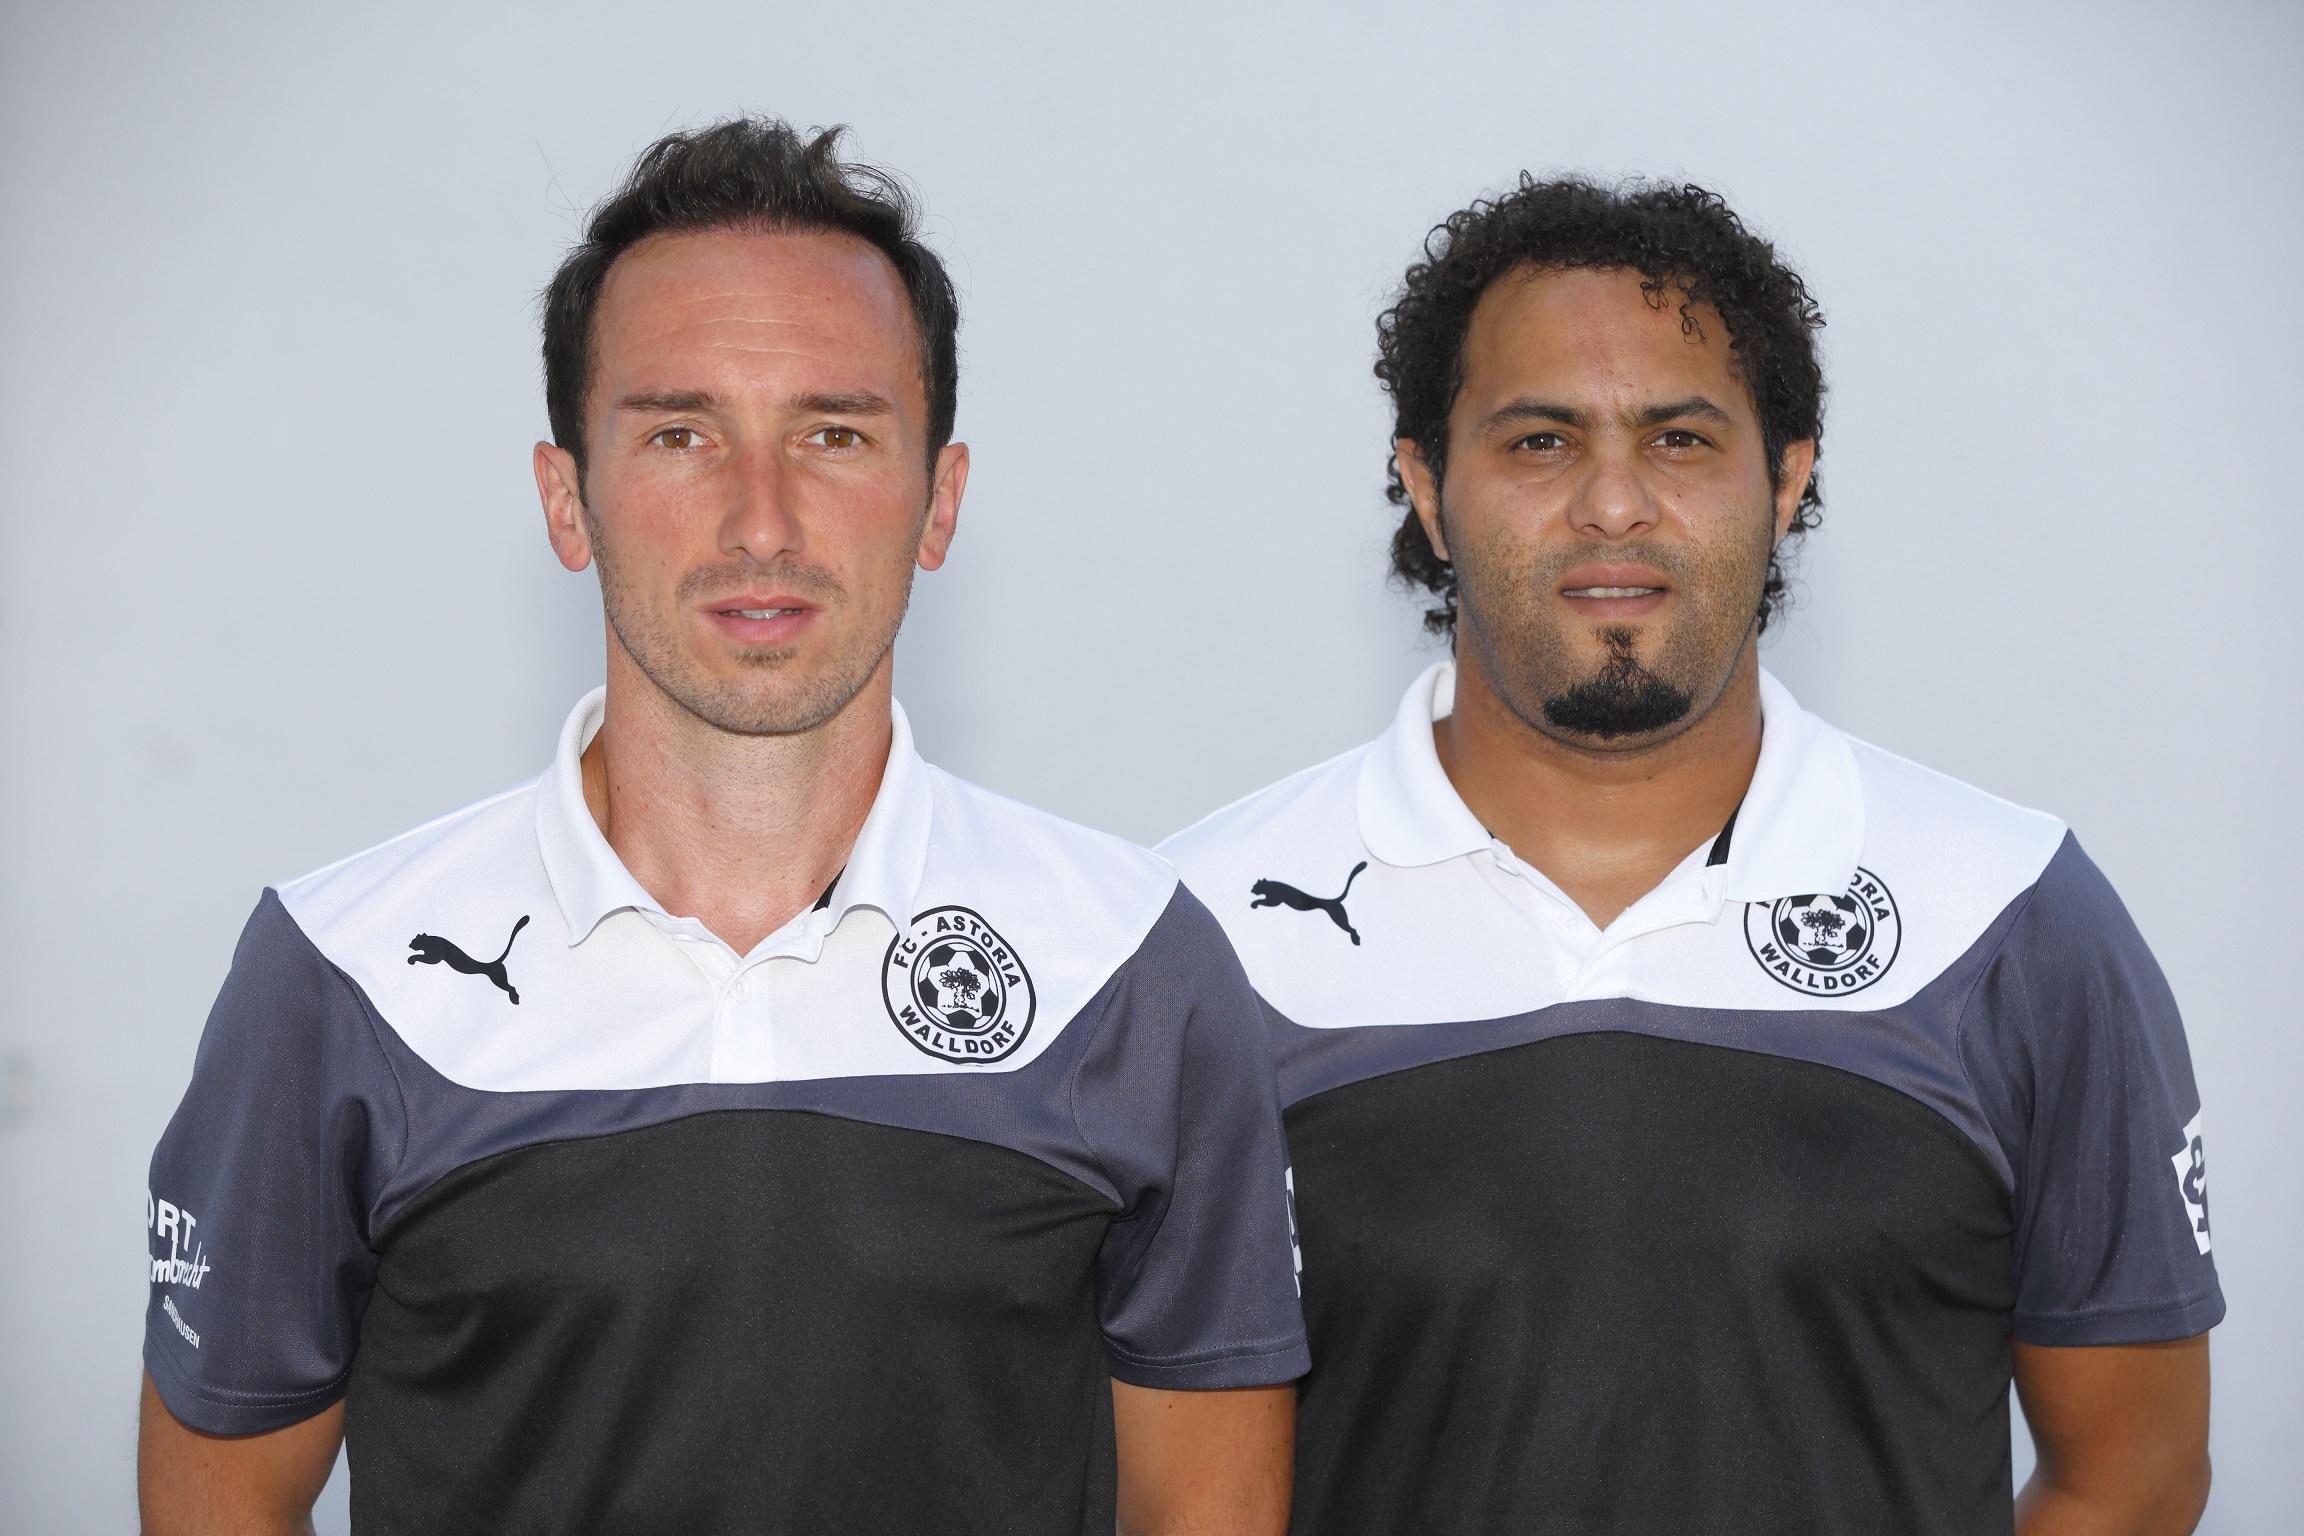 FC Astoria Walldorf II. Saison 2015-2016. Teammanager Roberto Pinto und Adil El Barhami. 04.07.2015 - Jan A. Pfeifer - 01726290959